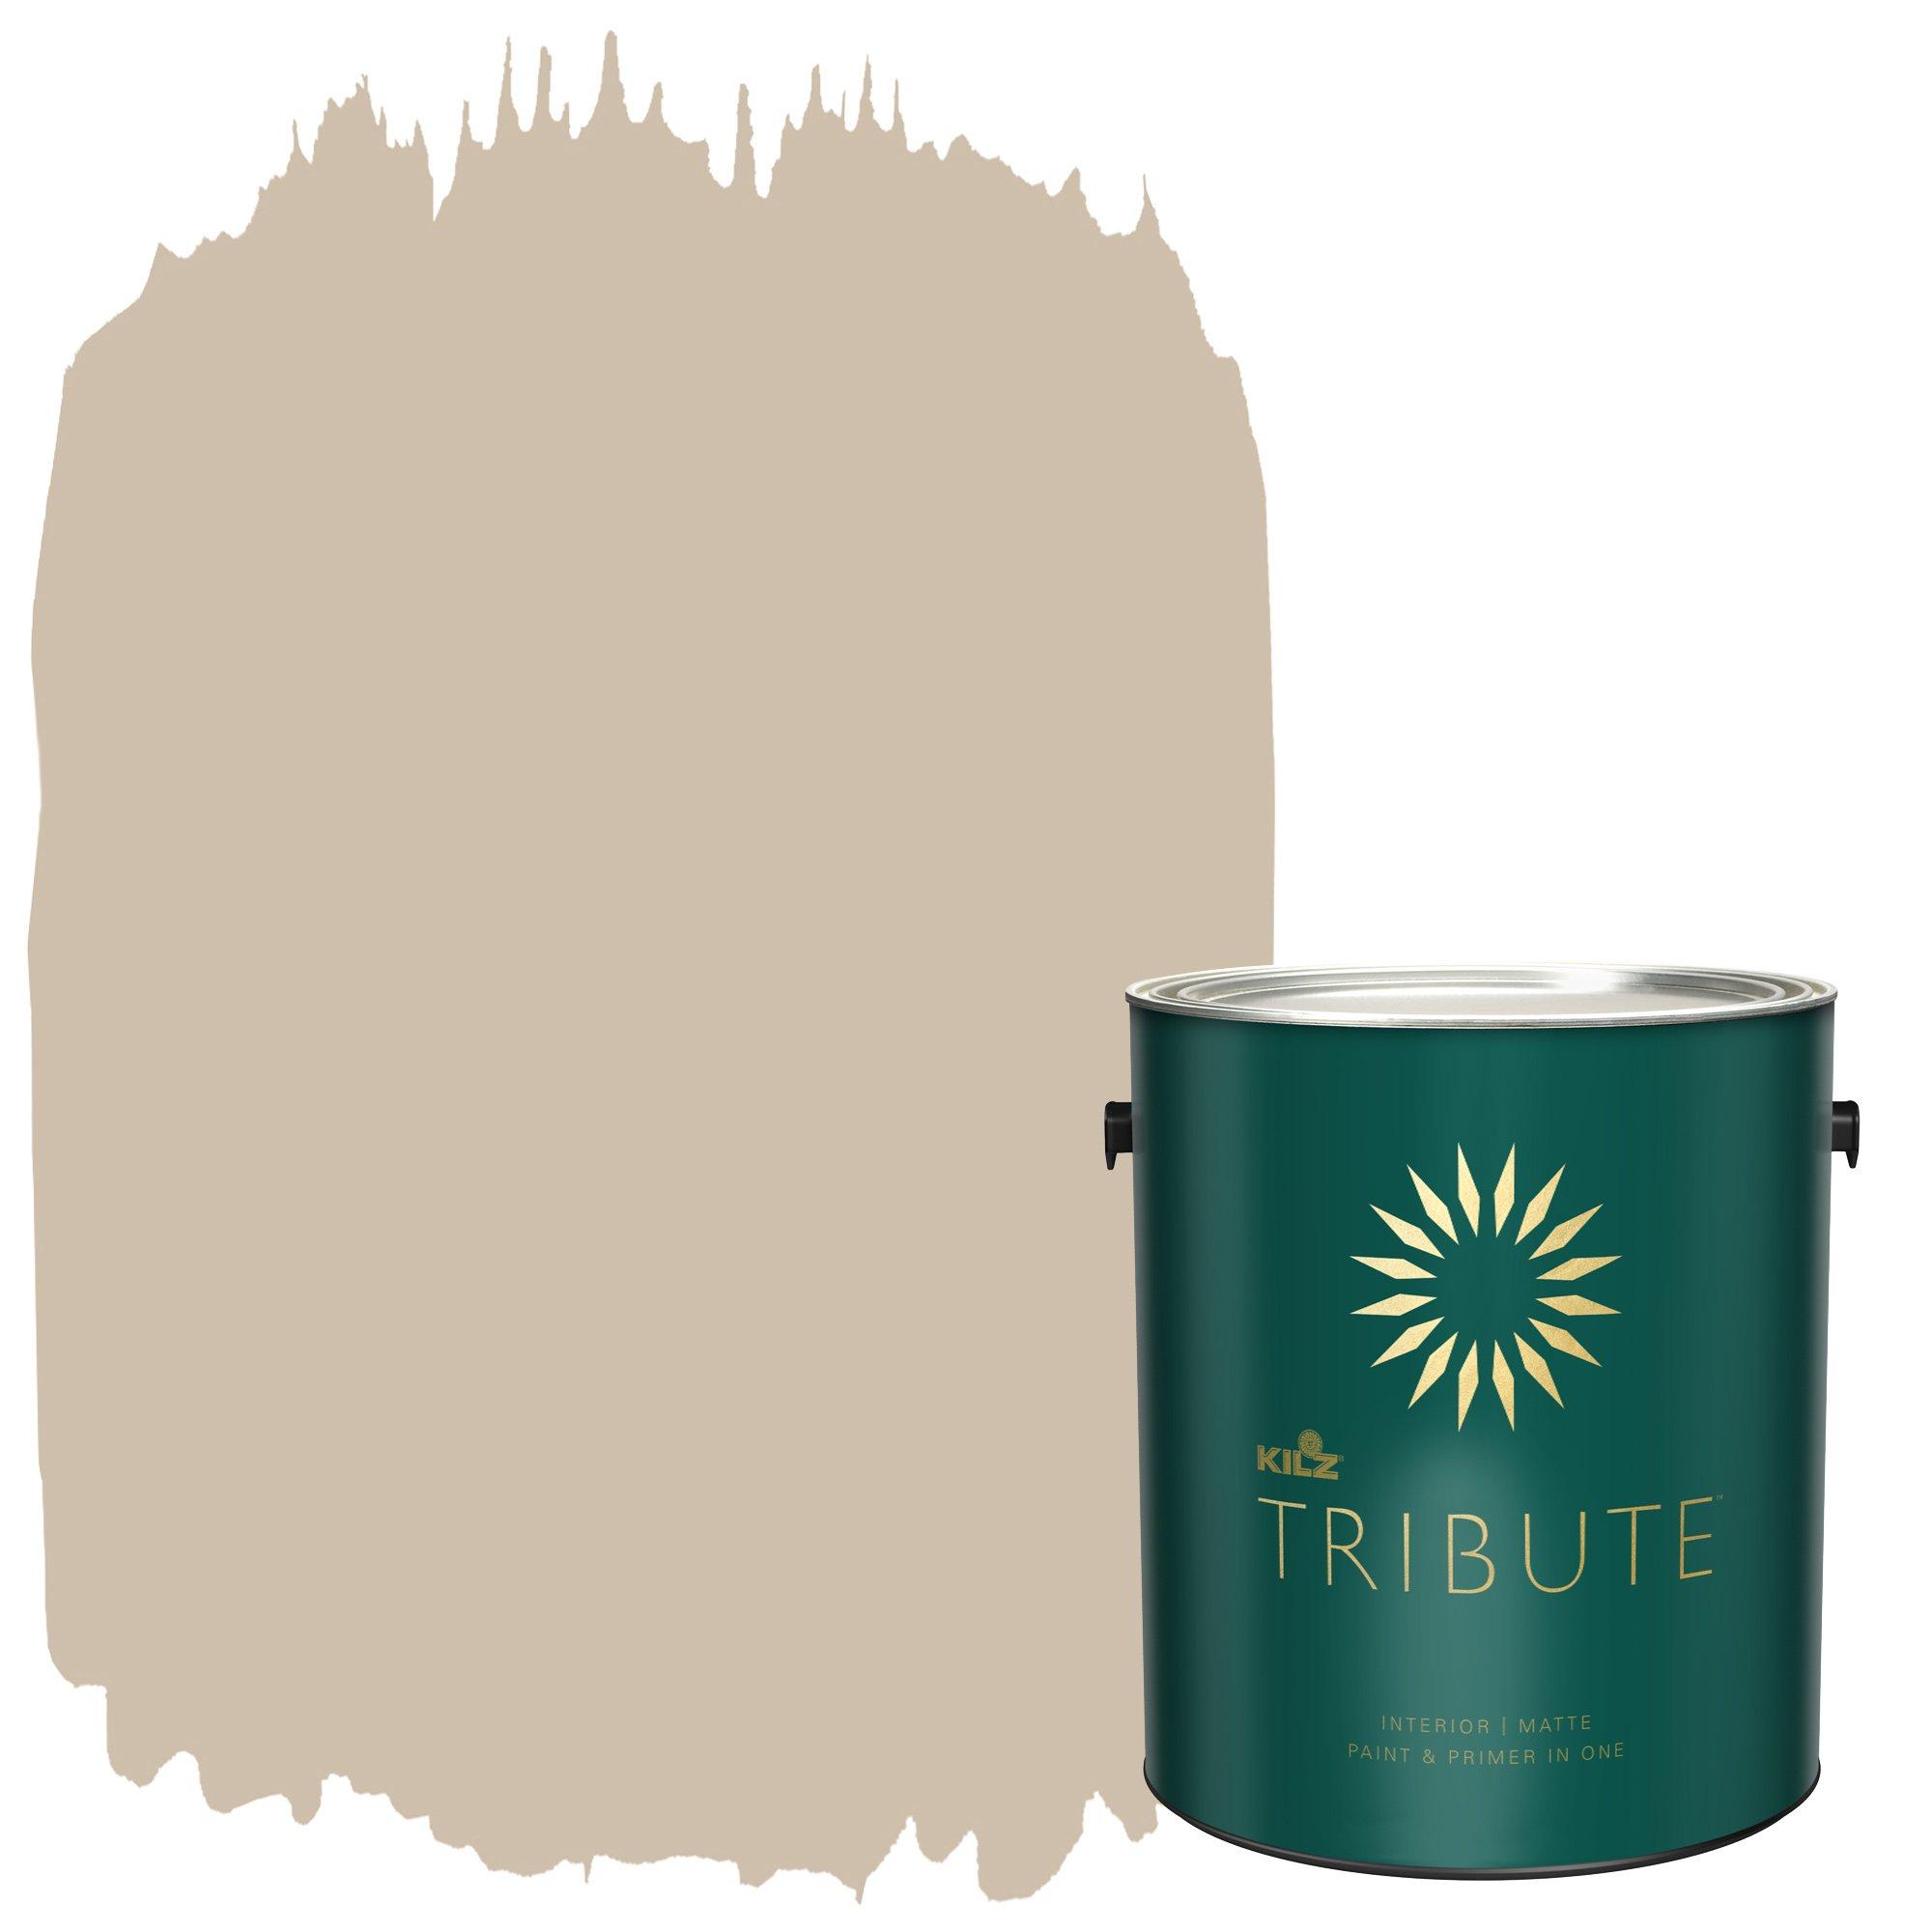 KILZ TRIBUTE Interior Matte Paint and Primer in One, 1 Gallon, Bronze Mist (TB-13) by KILZ